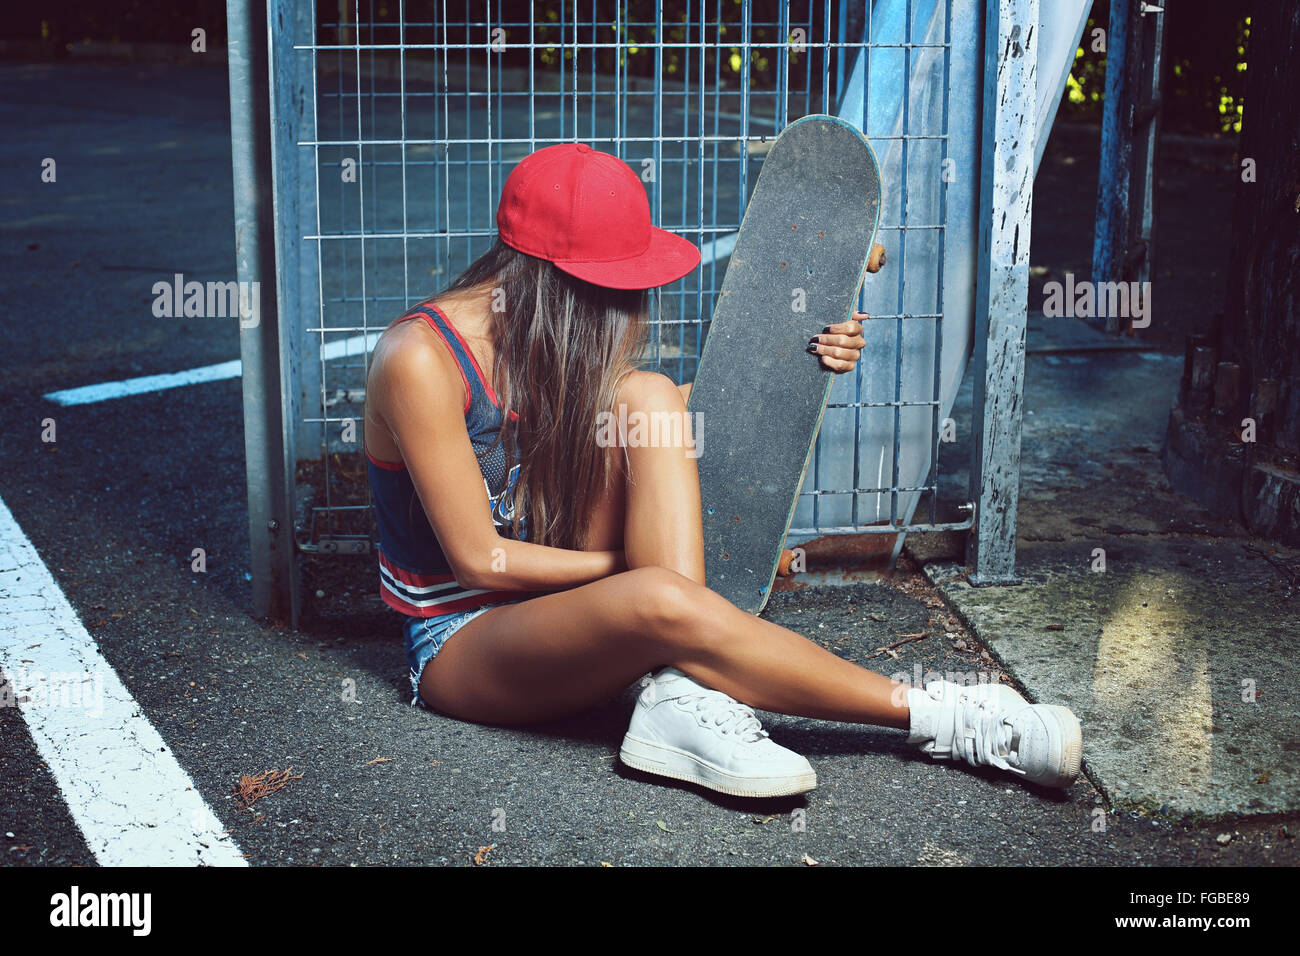 Skater girl seated on the street . Urban shot - Stock Image